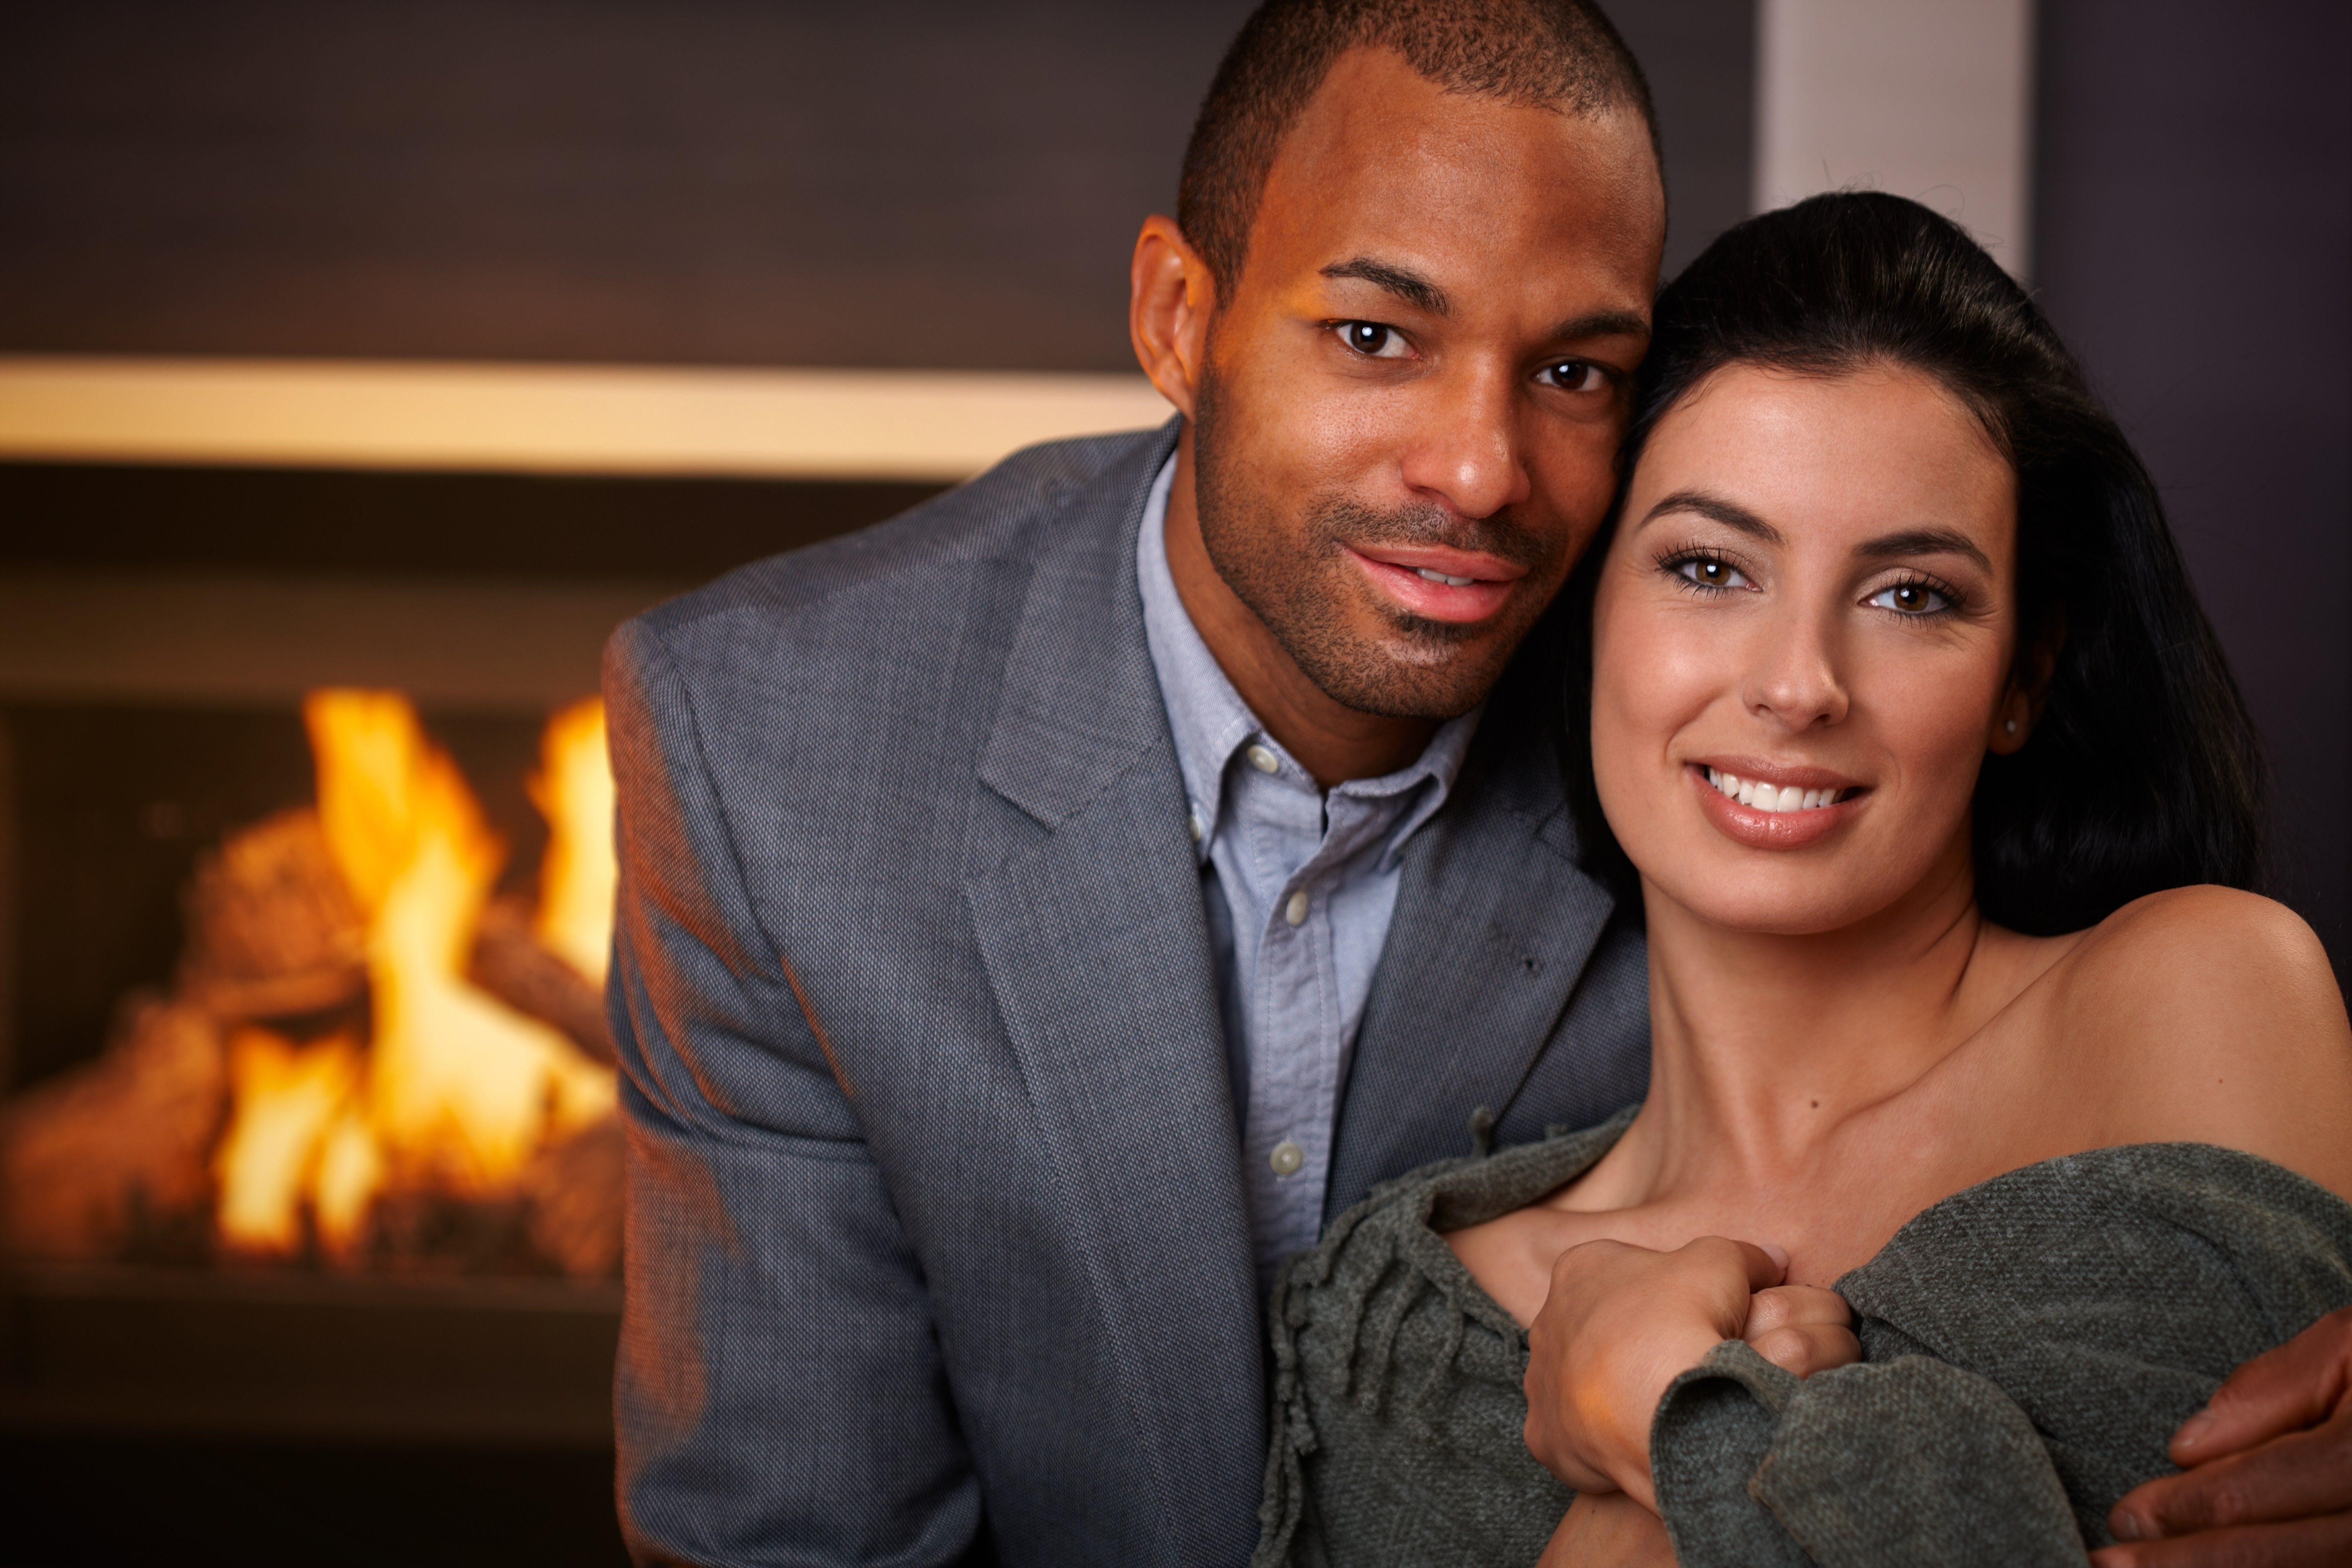 Interracial dating site app 2